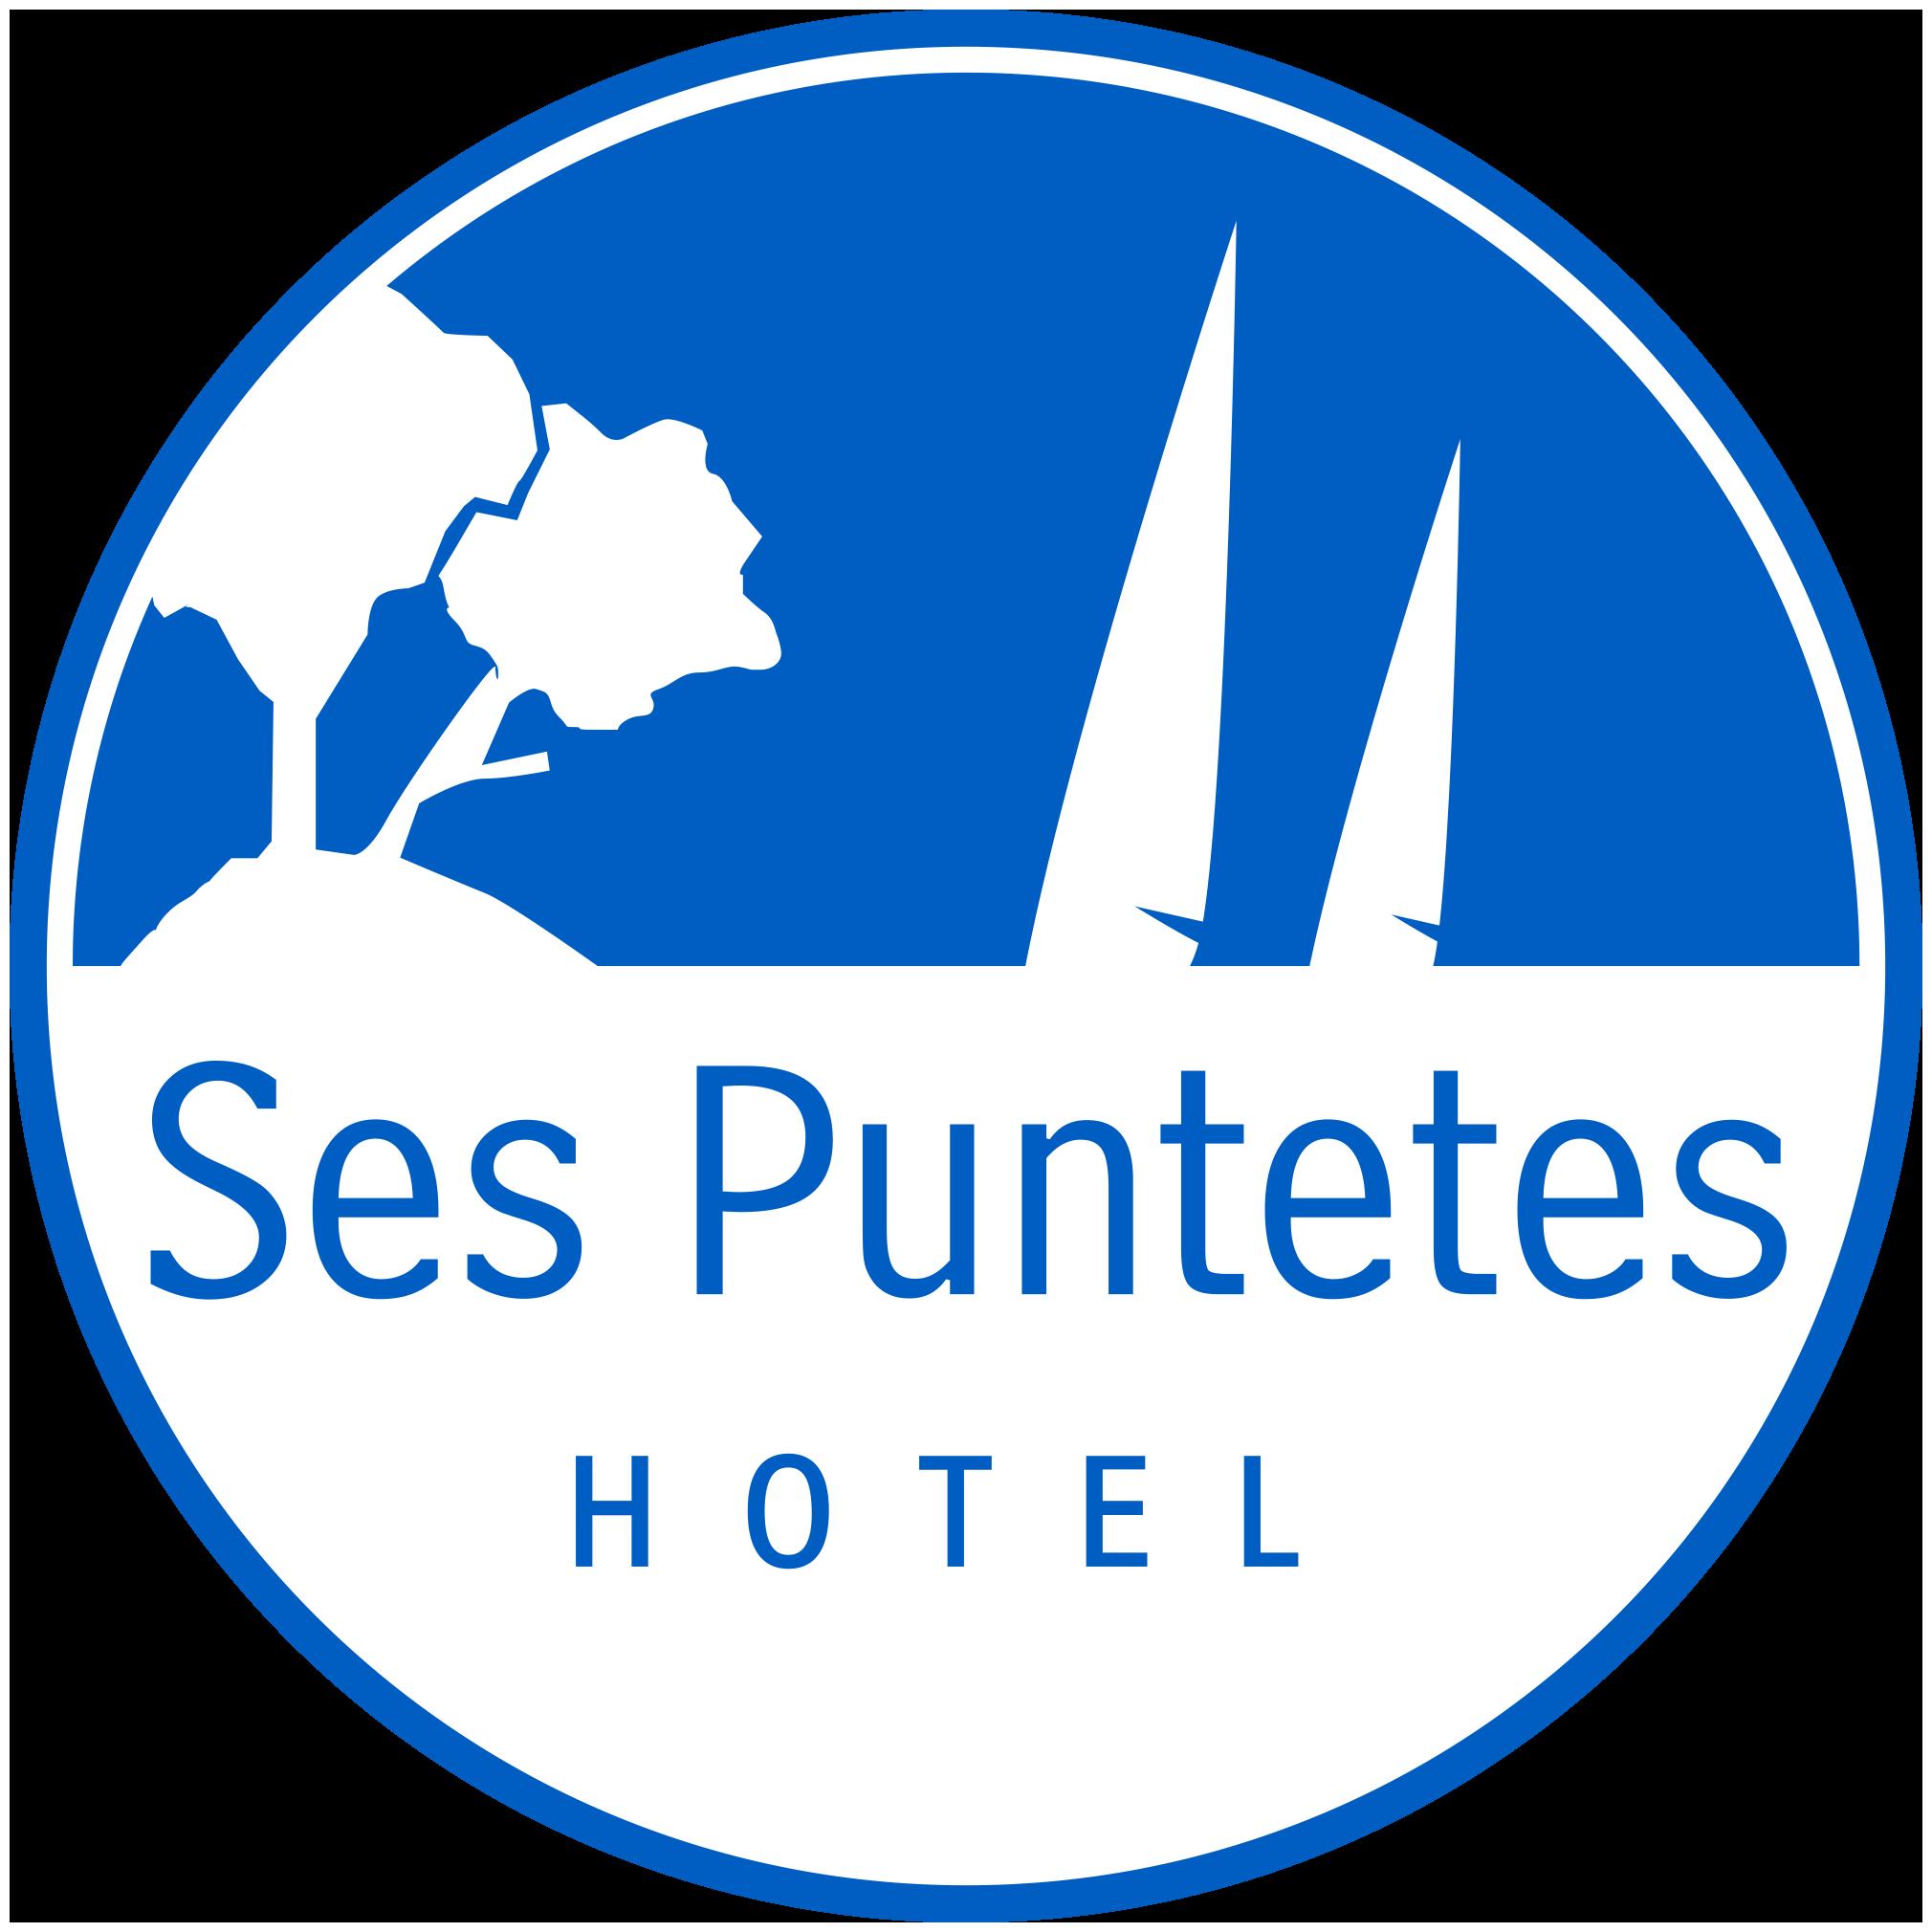 Hotel Ses Puntetes